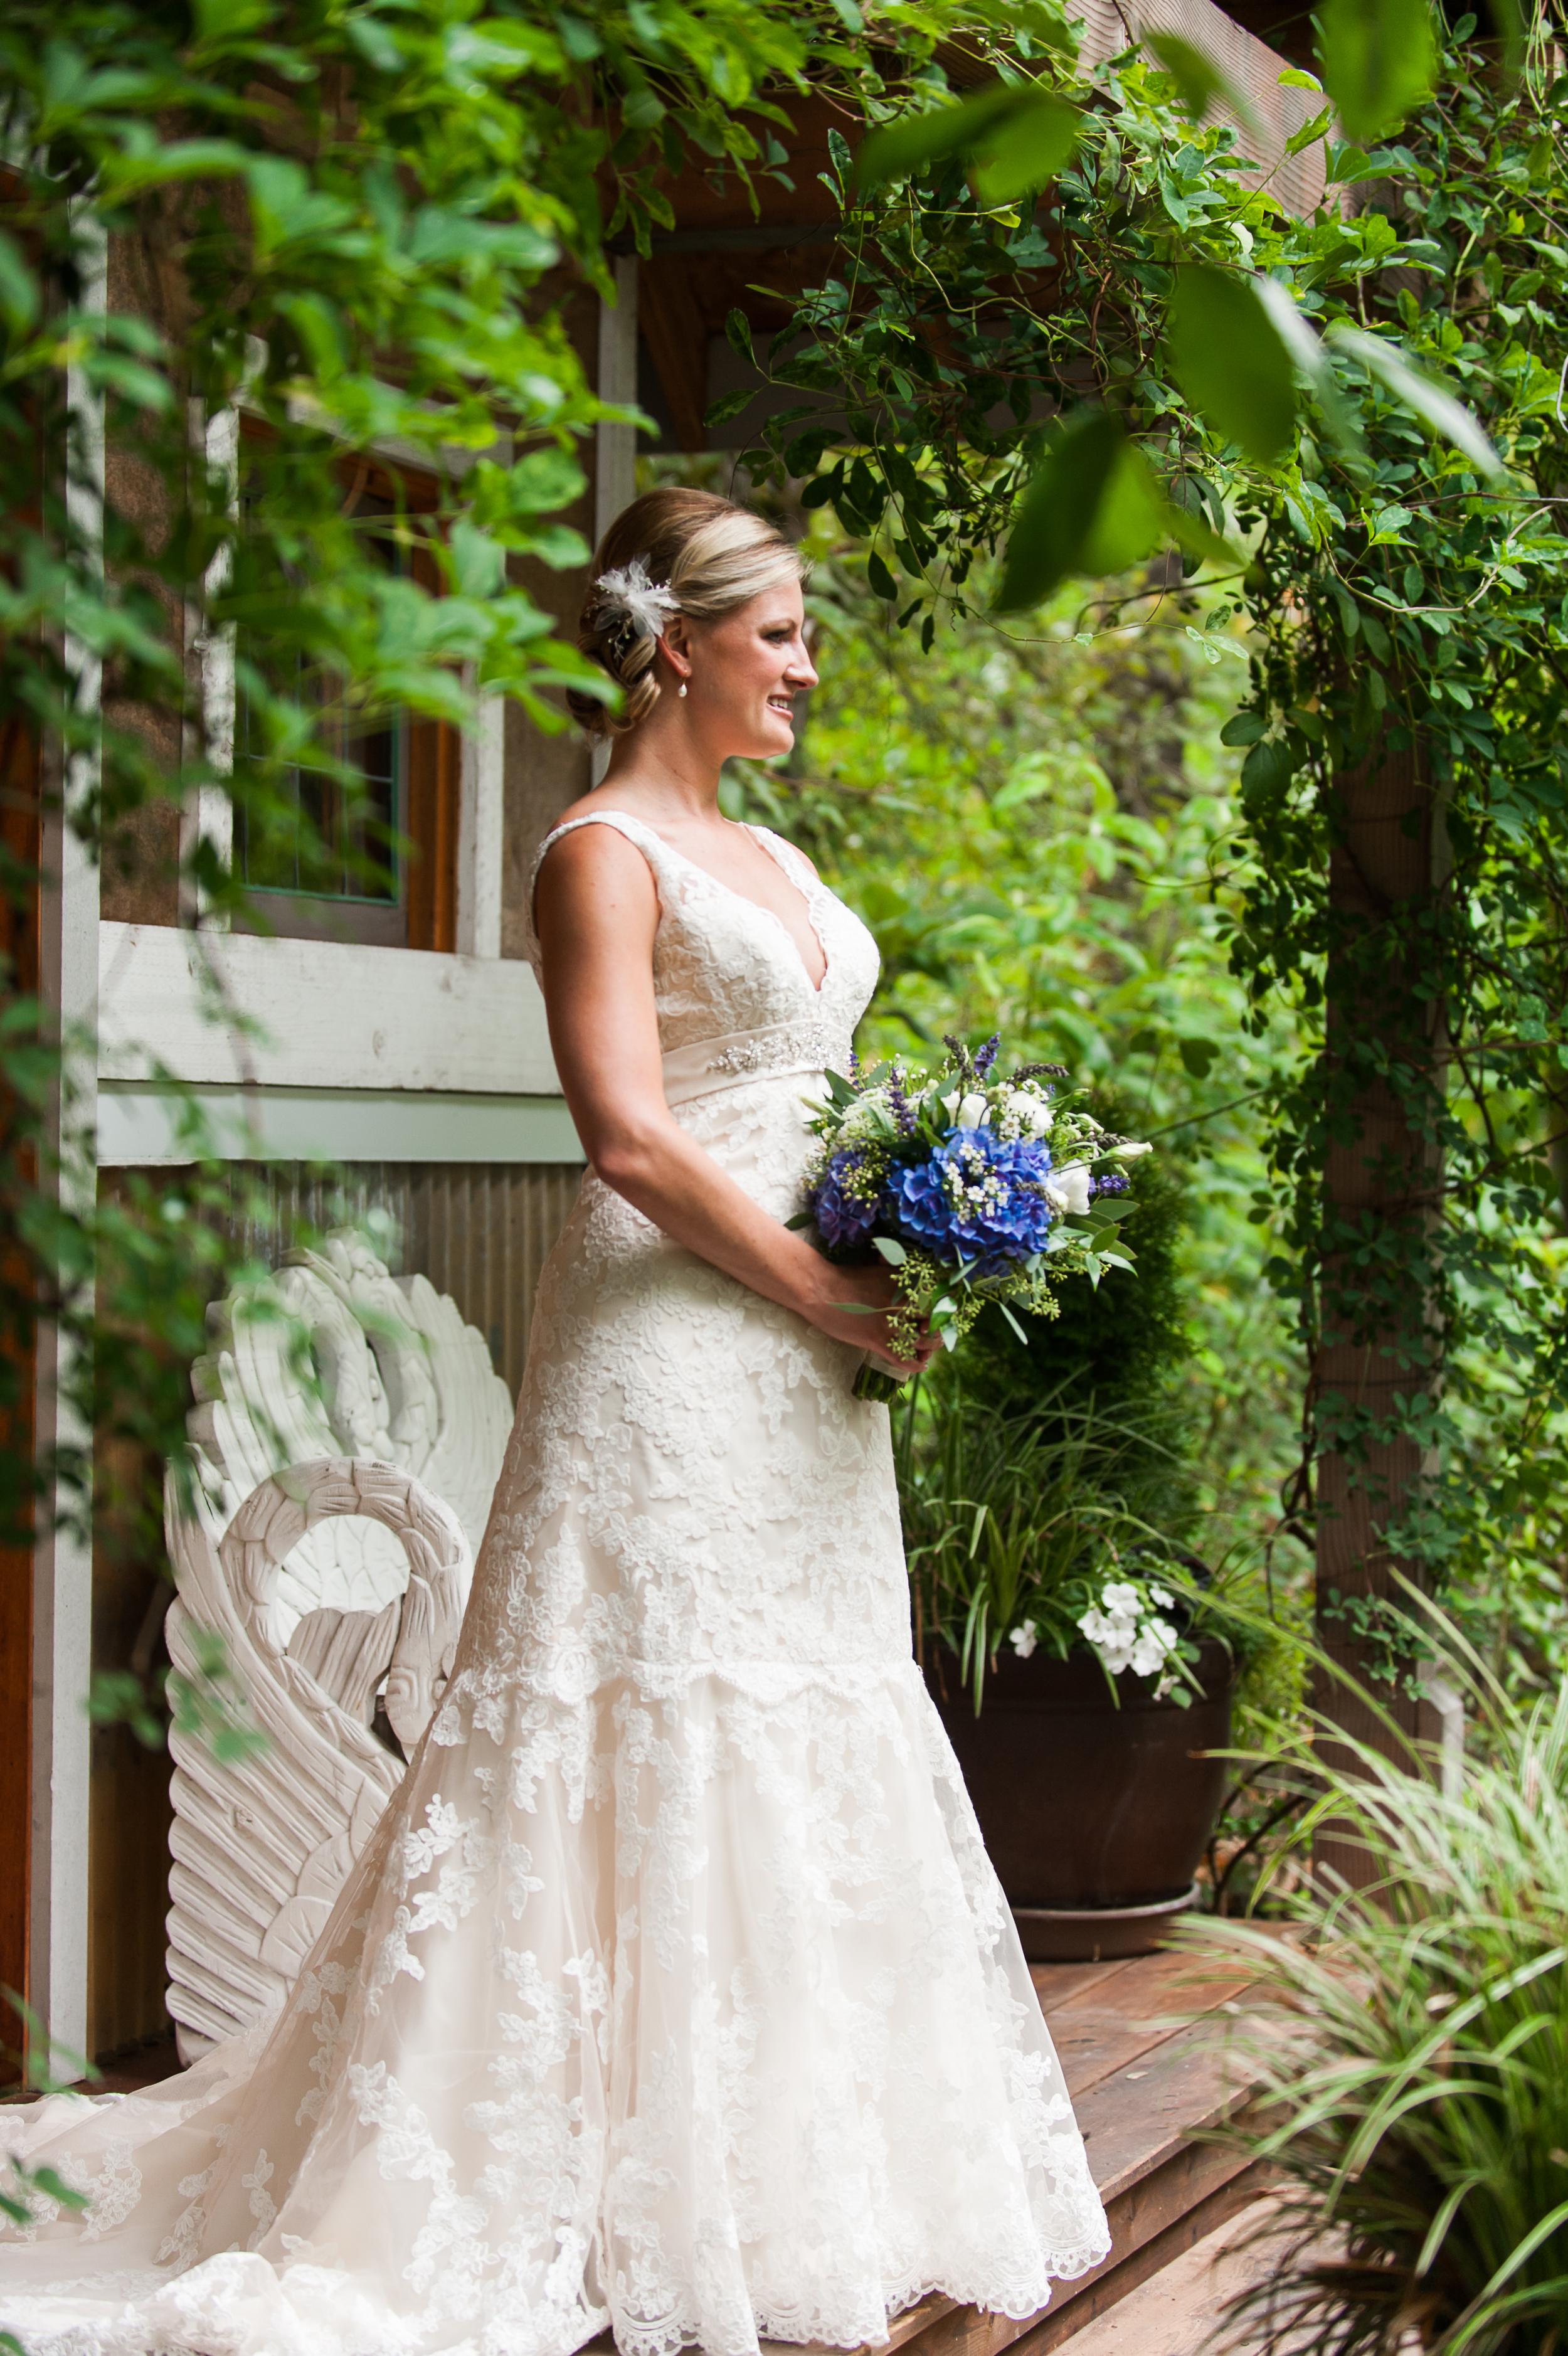 JJ-wedding-Van-Wyhe-Photography-076.jpg